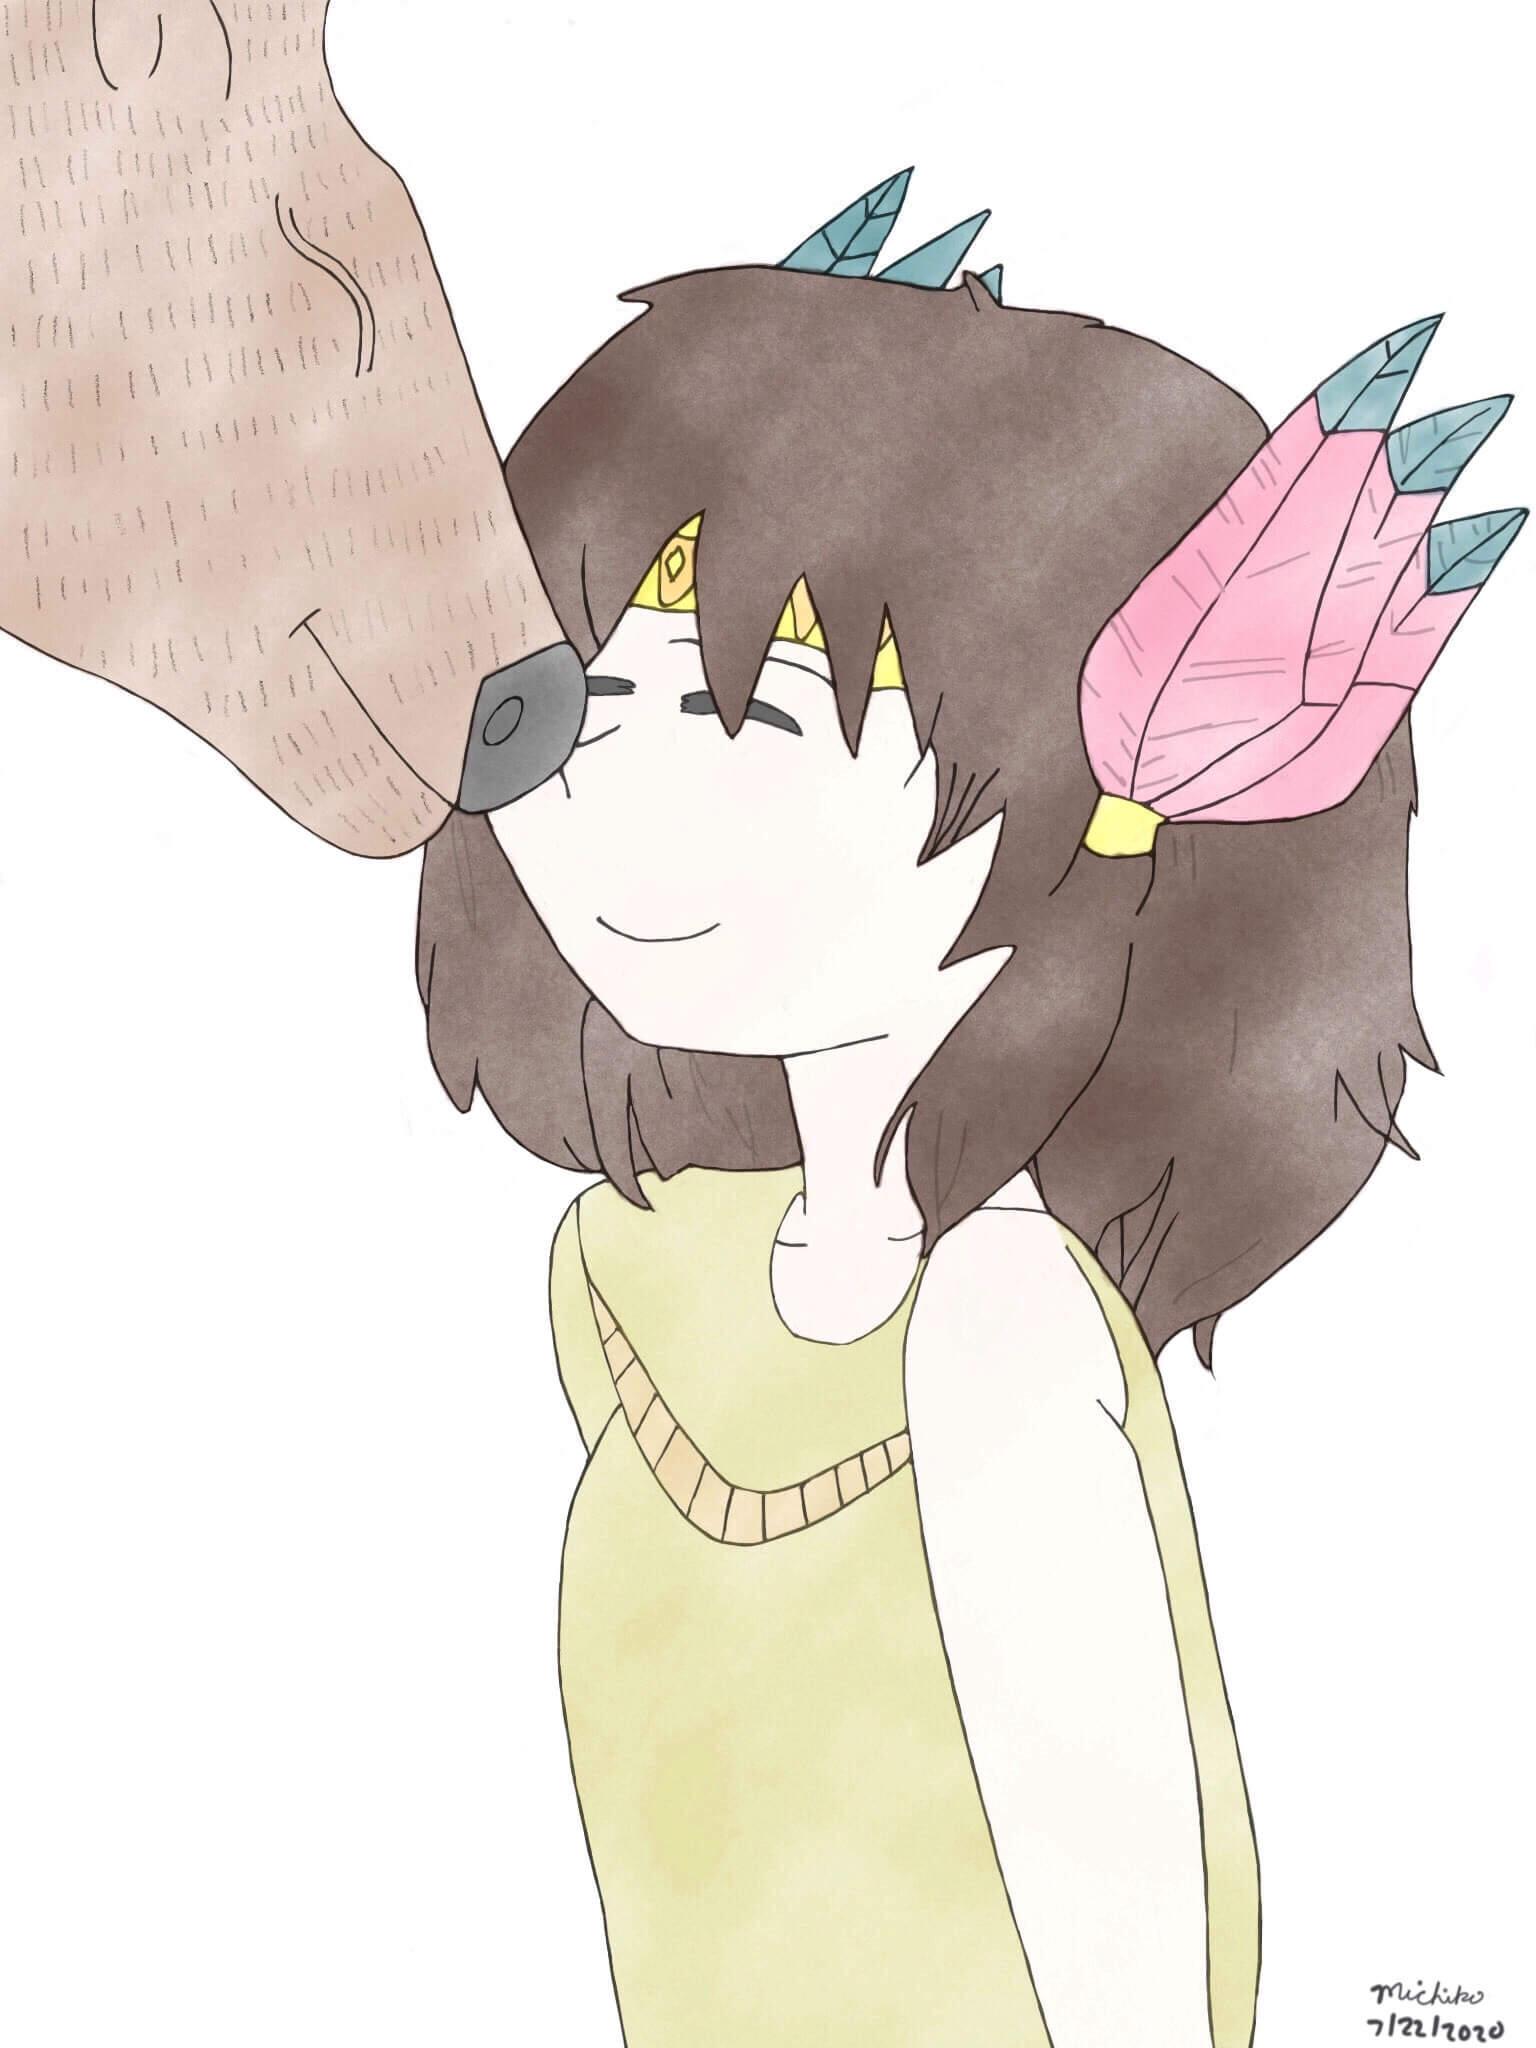 Tribal girl and her bear